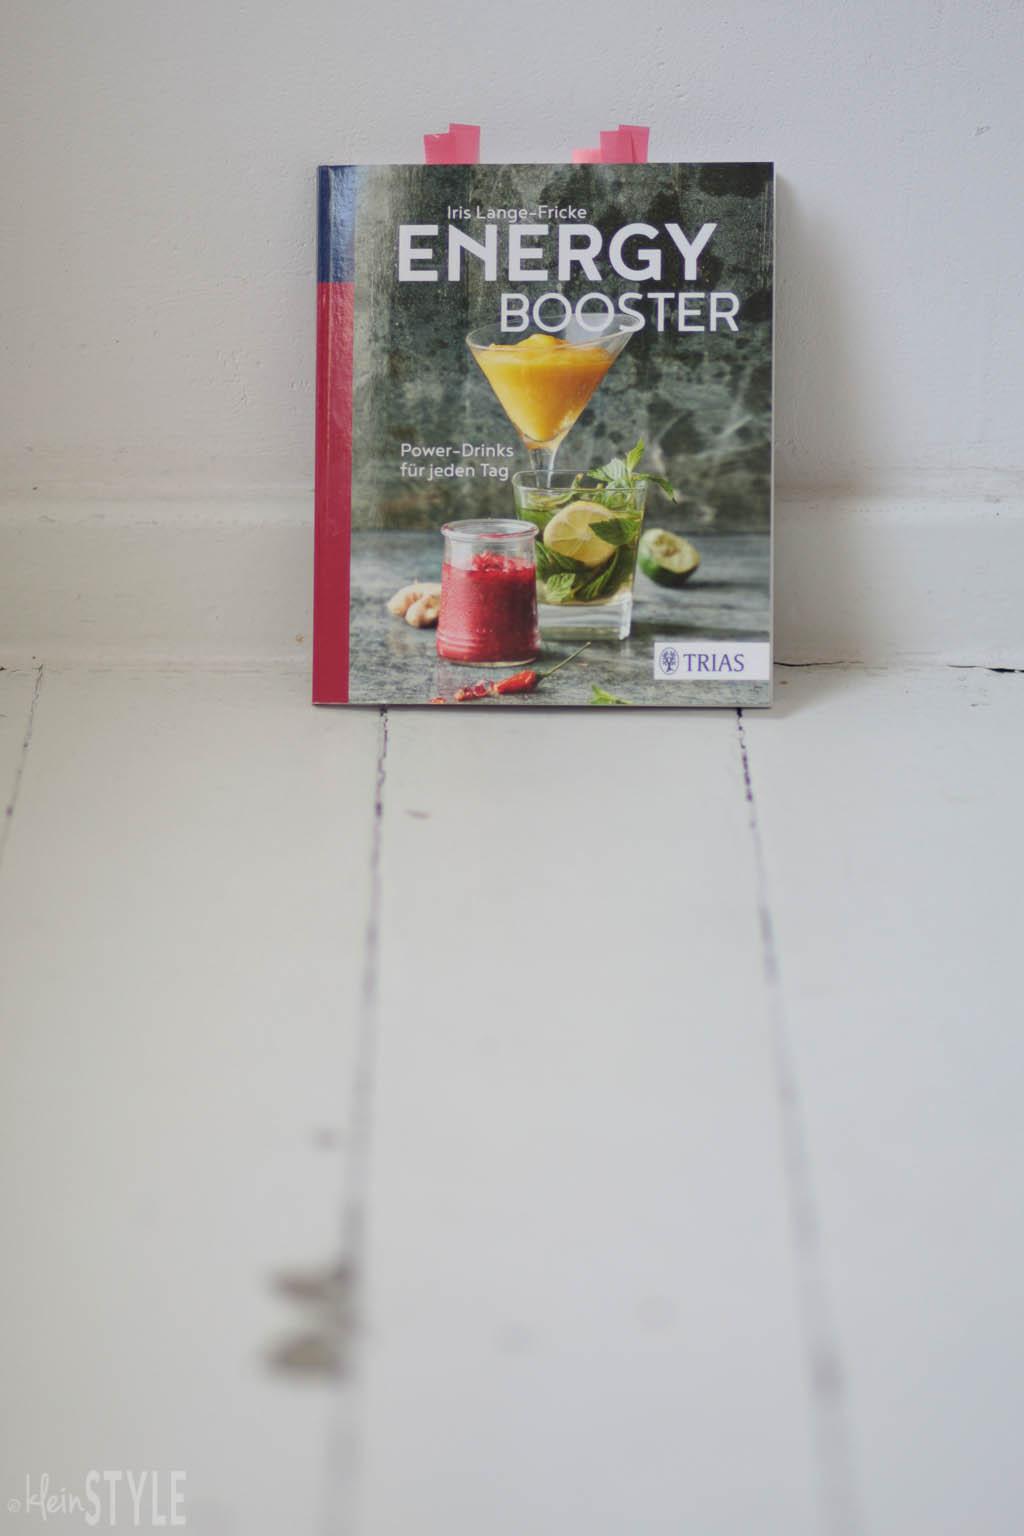 Energy Booster Powerdrinks Trias Verlag rezension by kleinstyle.com